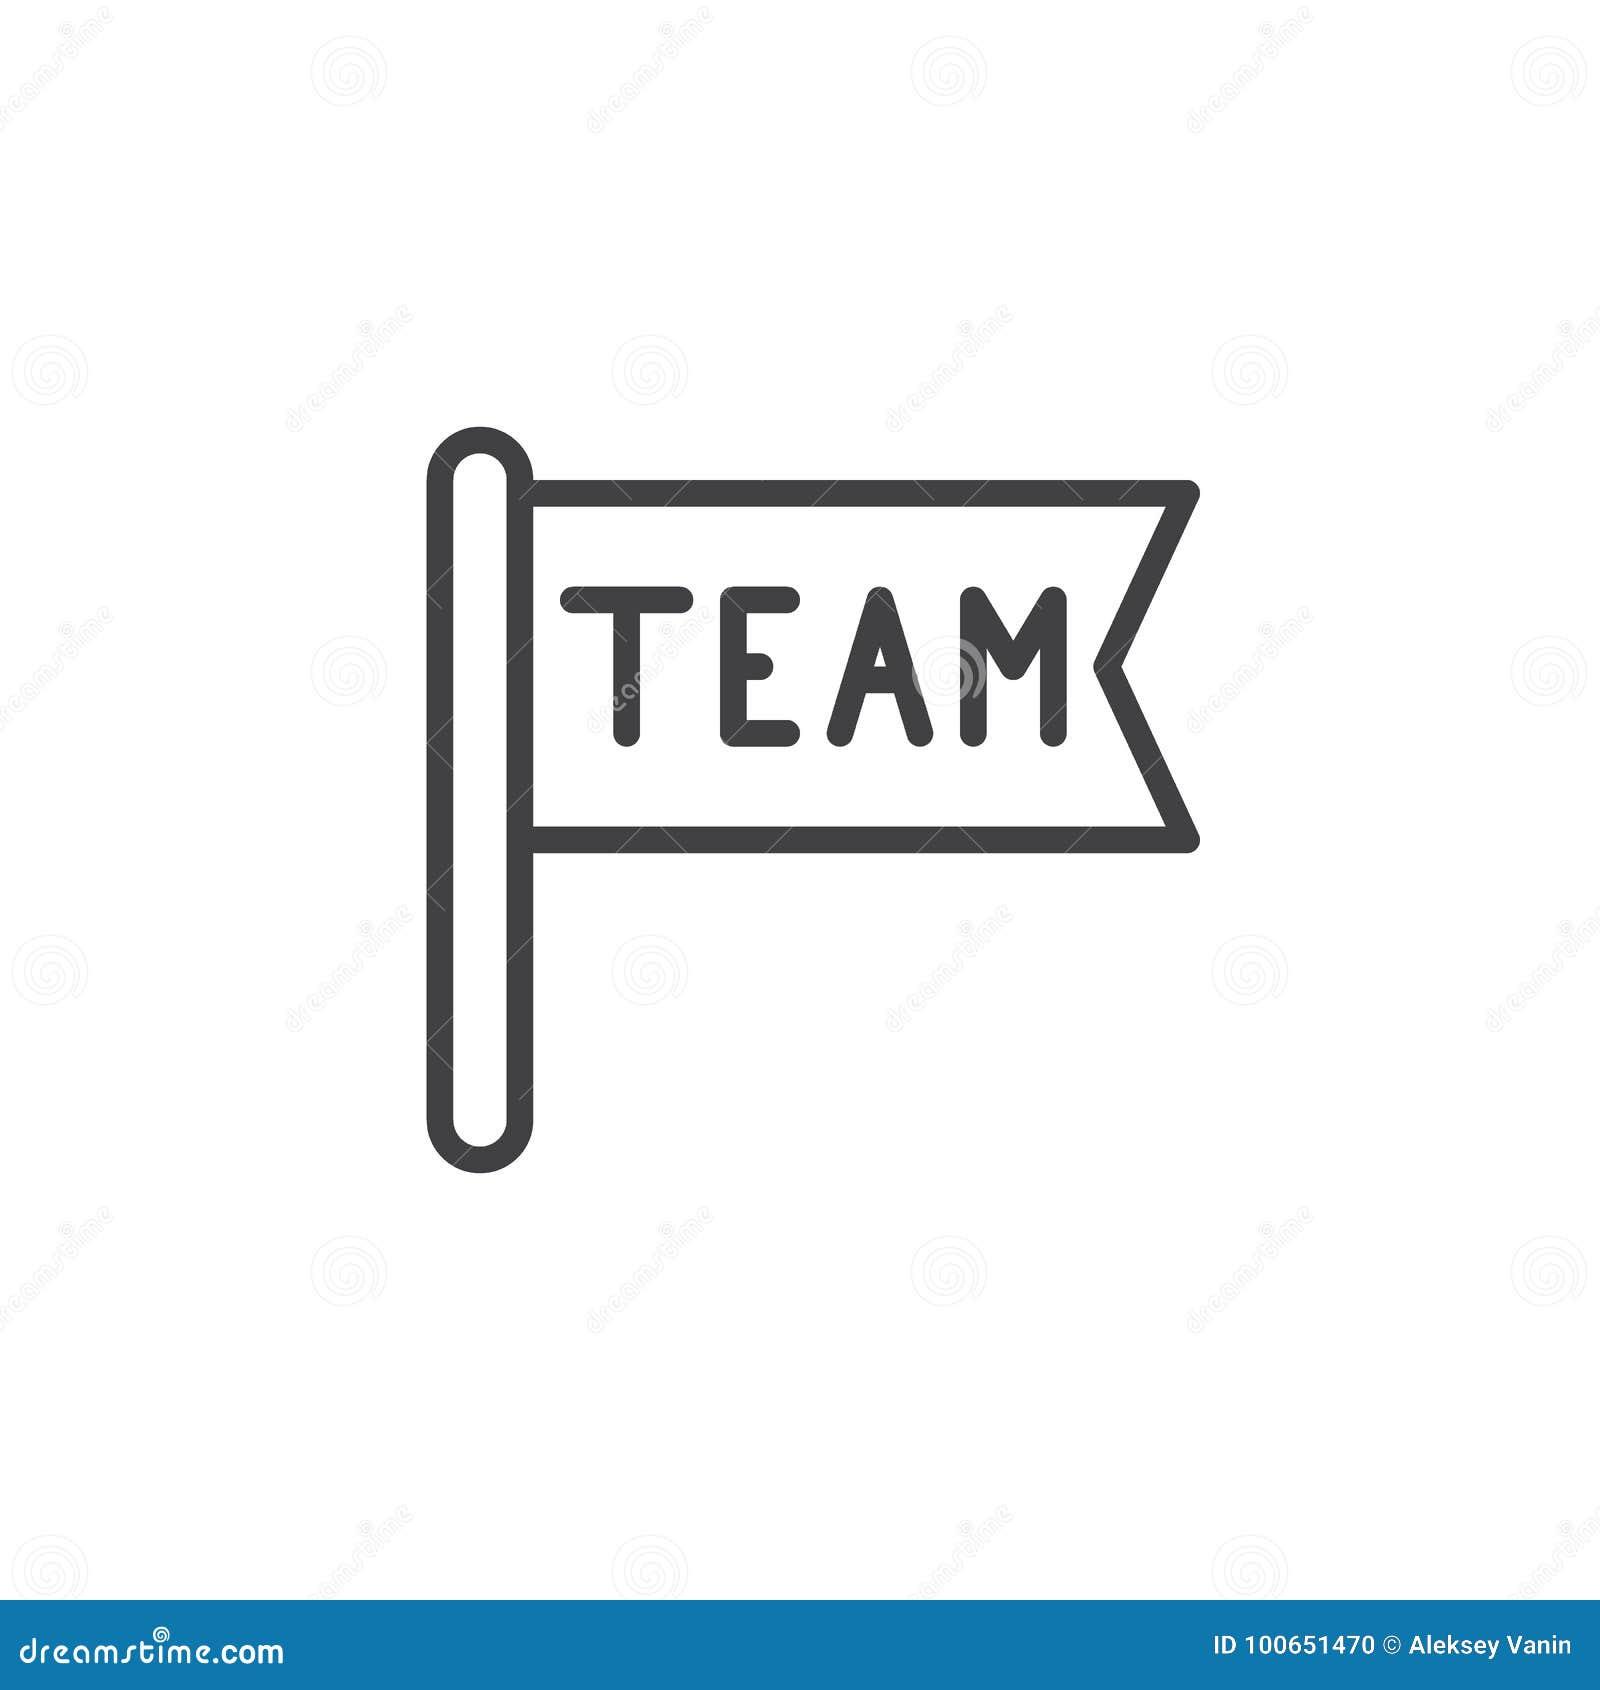 Teamflaggenlinie Ikone